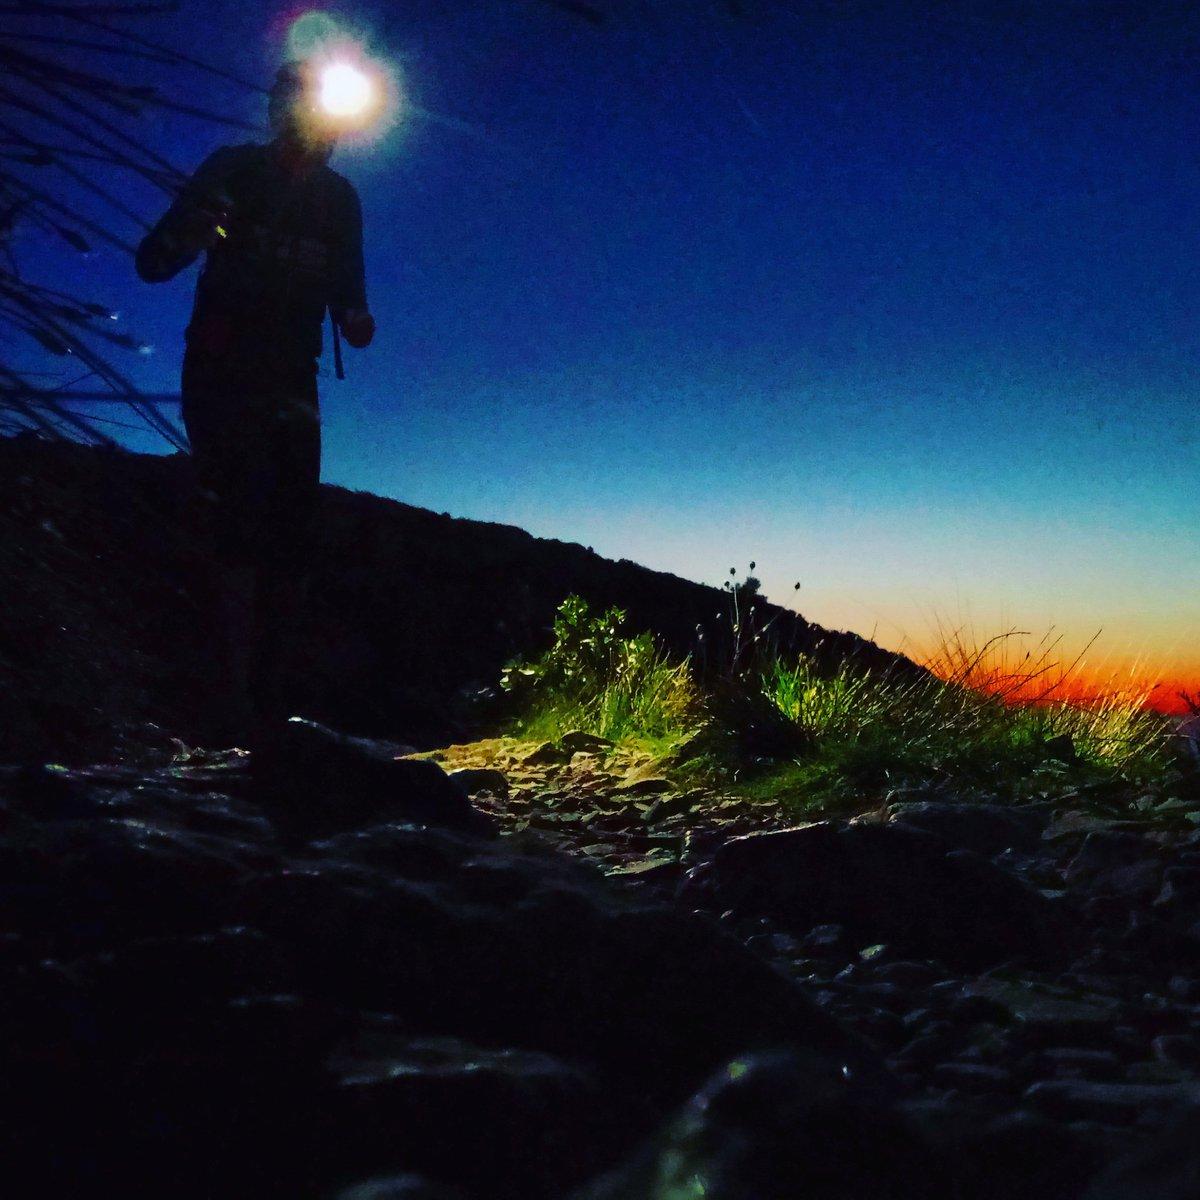 La nuit, un autre chemin commence... #trailrunning #trail #running<br>http://pic.twitter.com/LNsNeskgzl